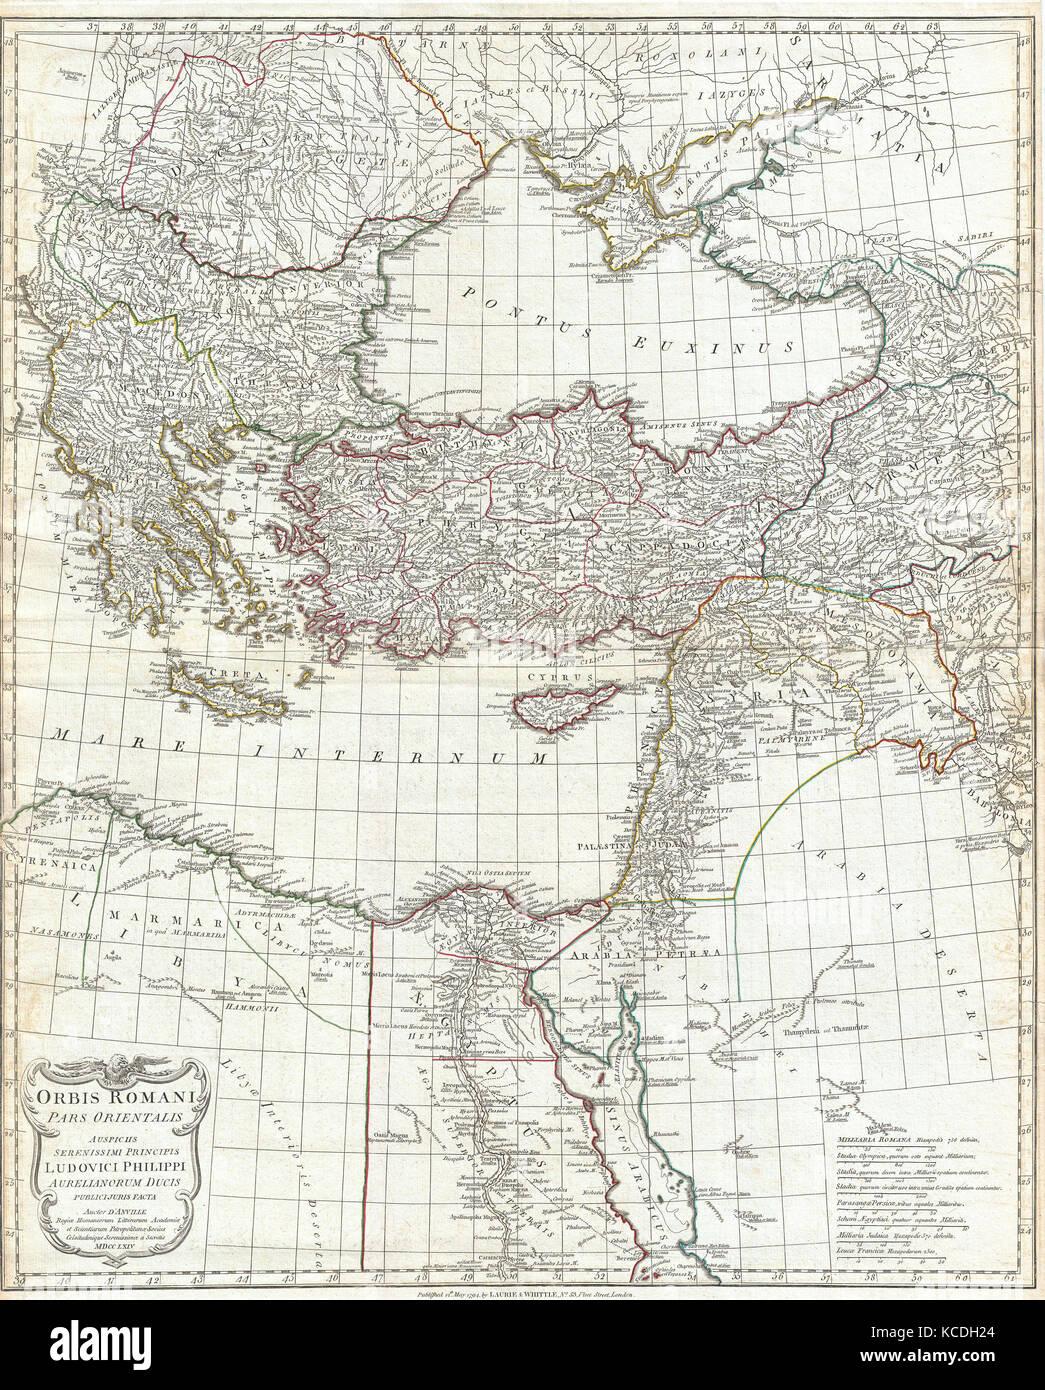 1794, Anville Site de l'Empire Romain, la Grèce inclues Photo Stock